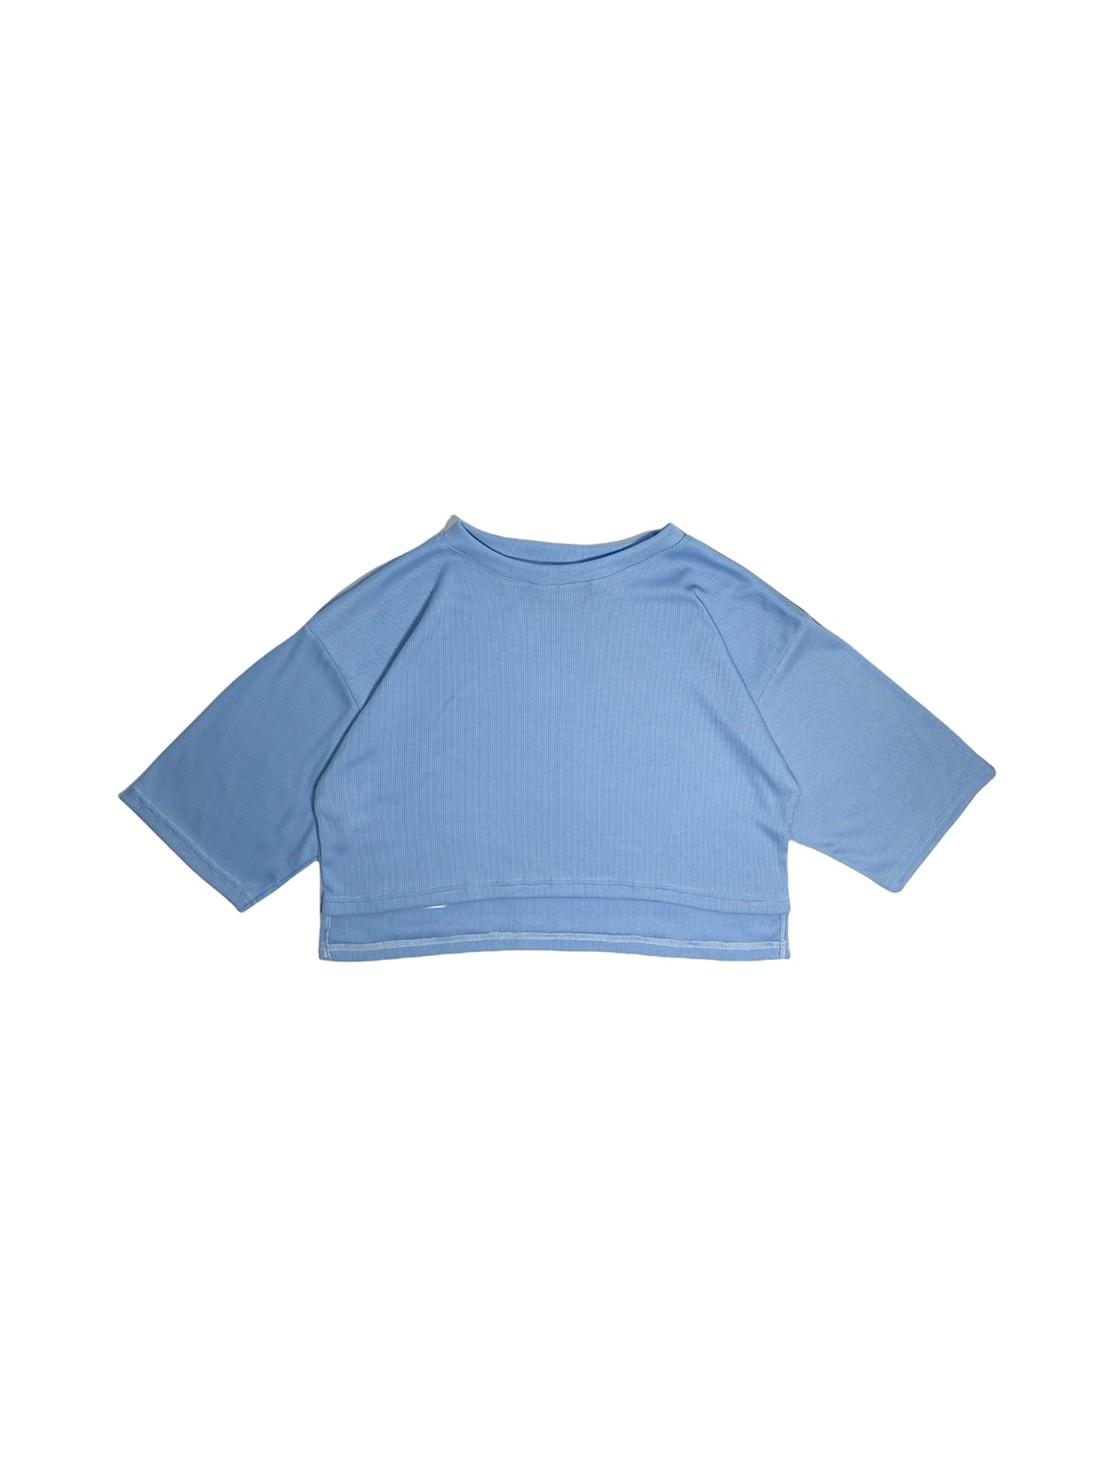 Aster (Blue)